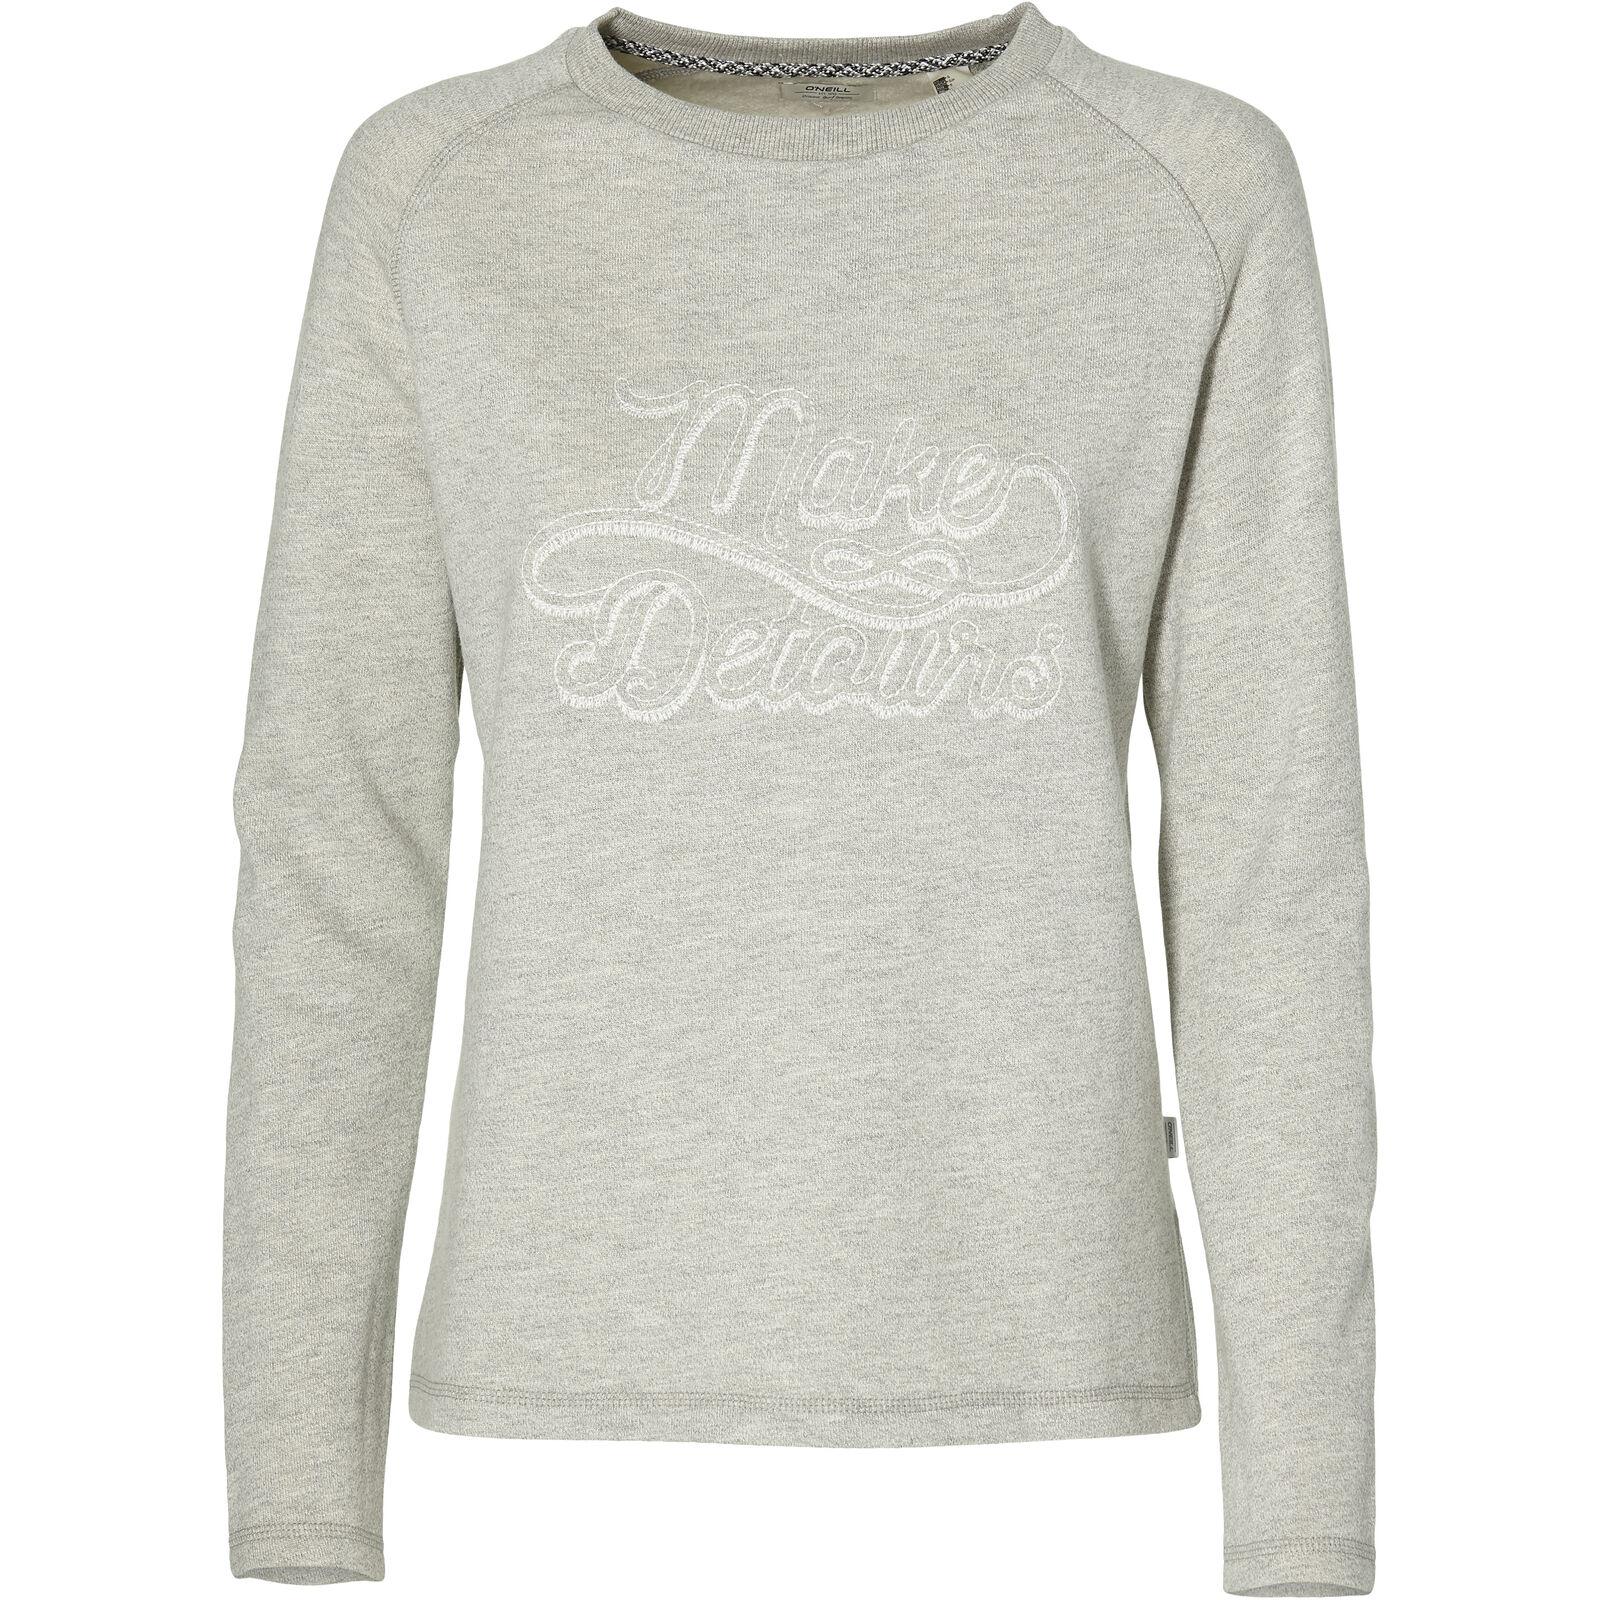 O'Neill Sweatshirt Sweater Script Crew Sweatshirt hellgrey meliert